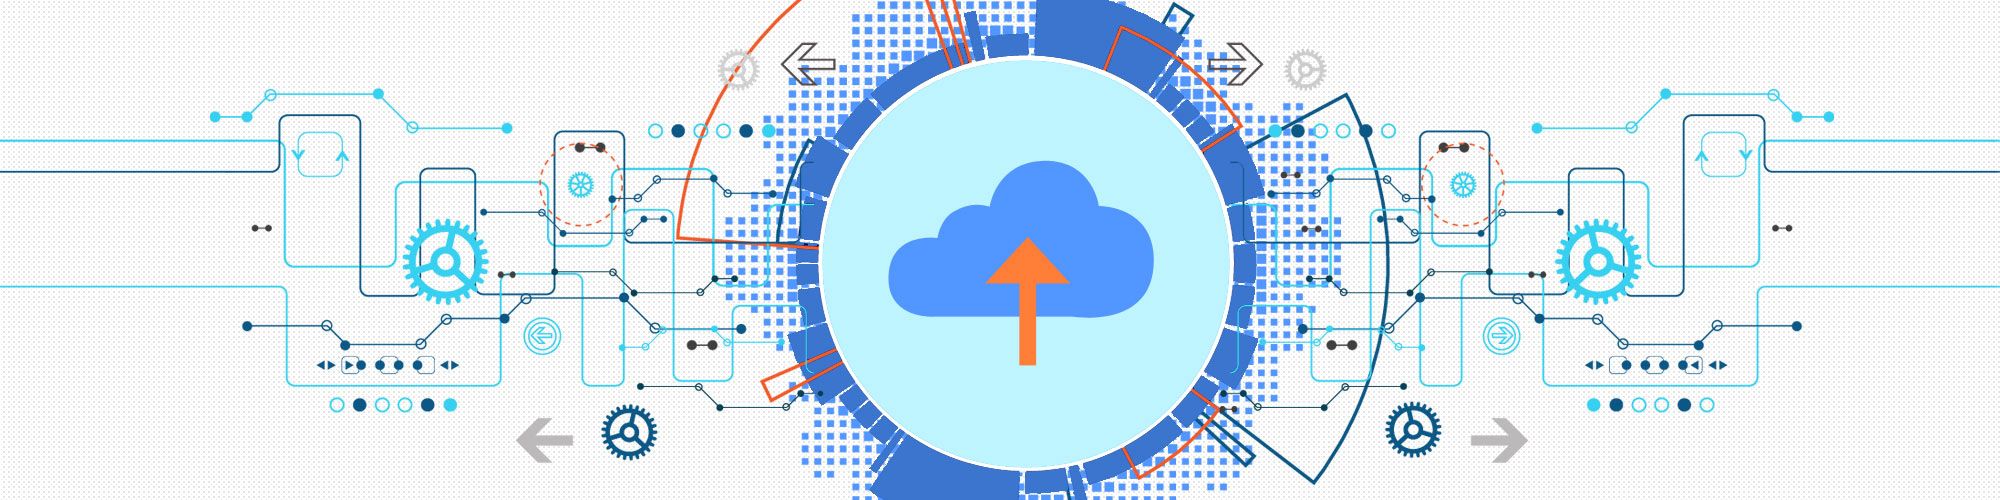 Cloud Storage | Core Facility Management Software | Facility